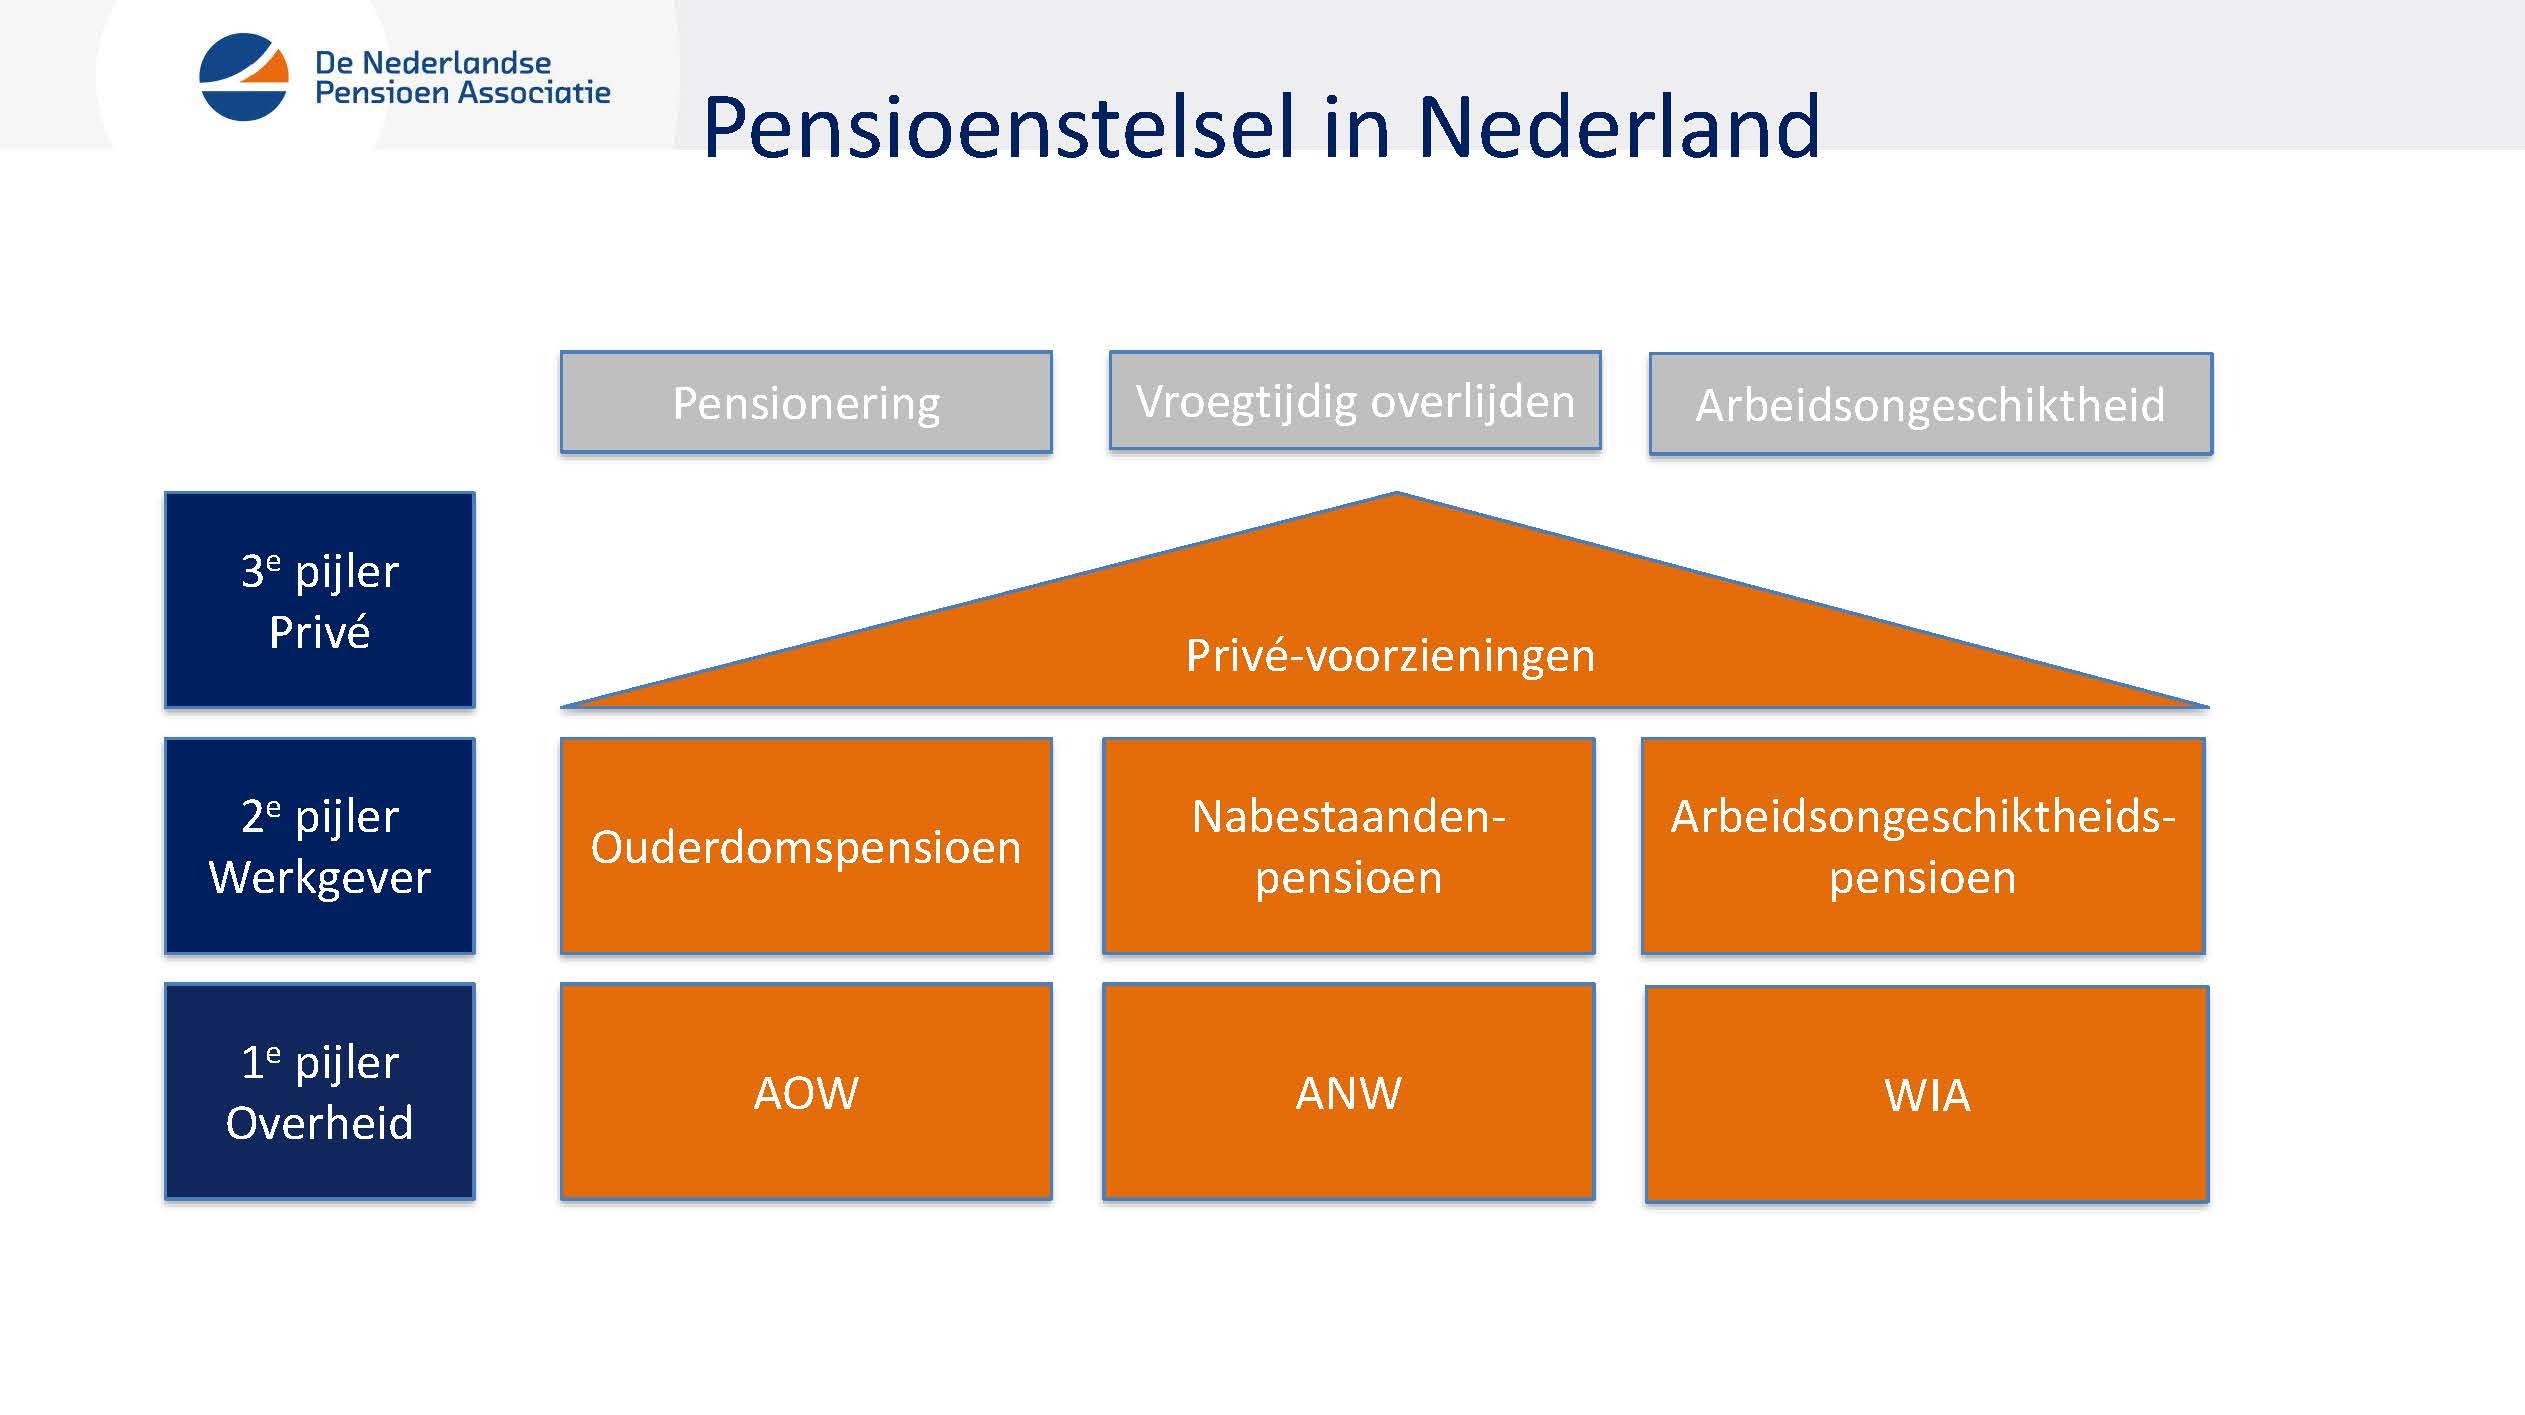 Pensioenstelsel in Nederland